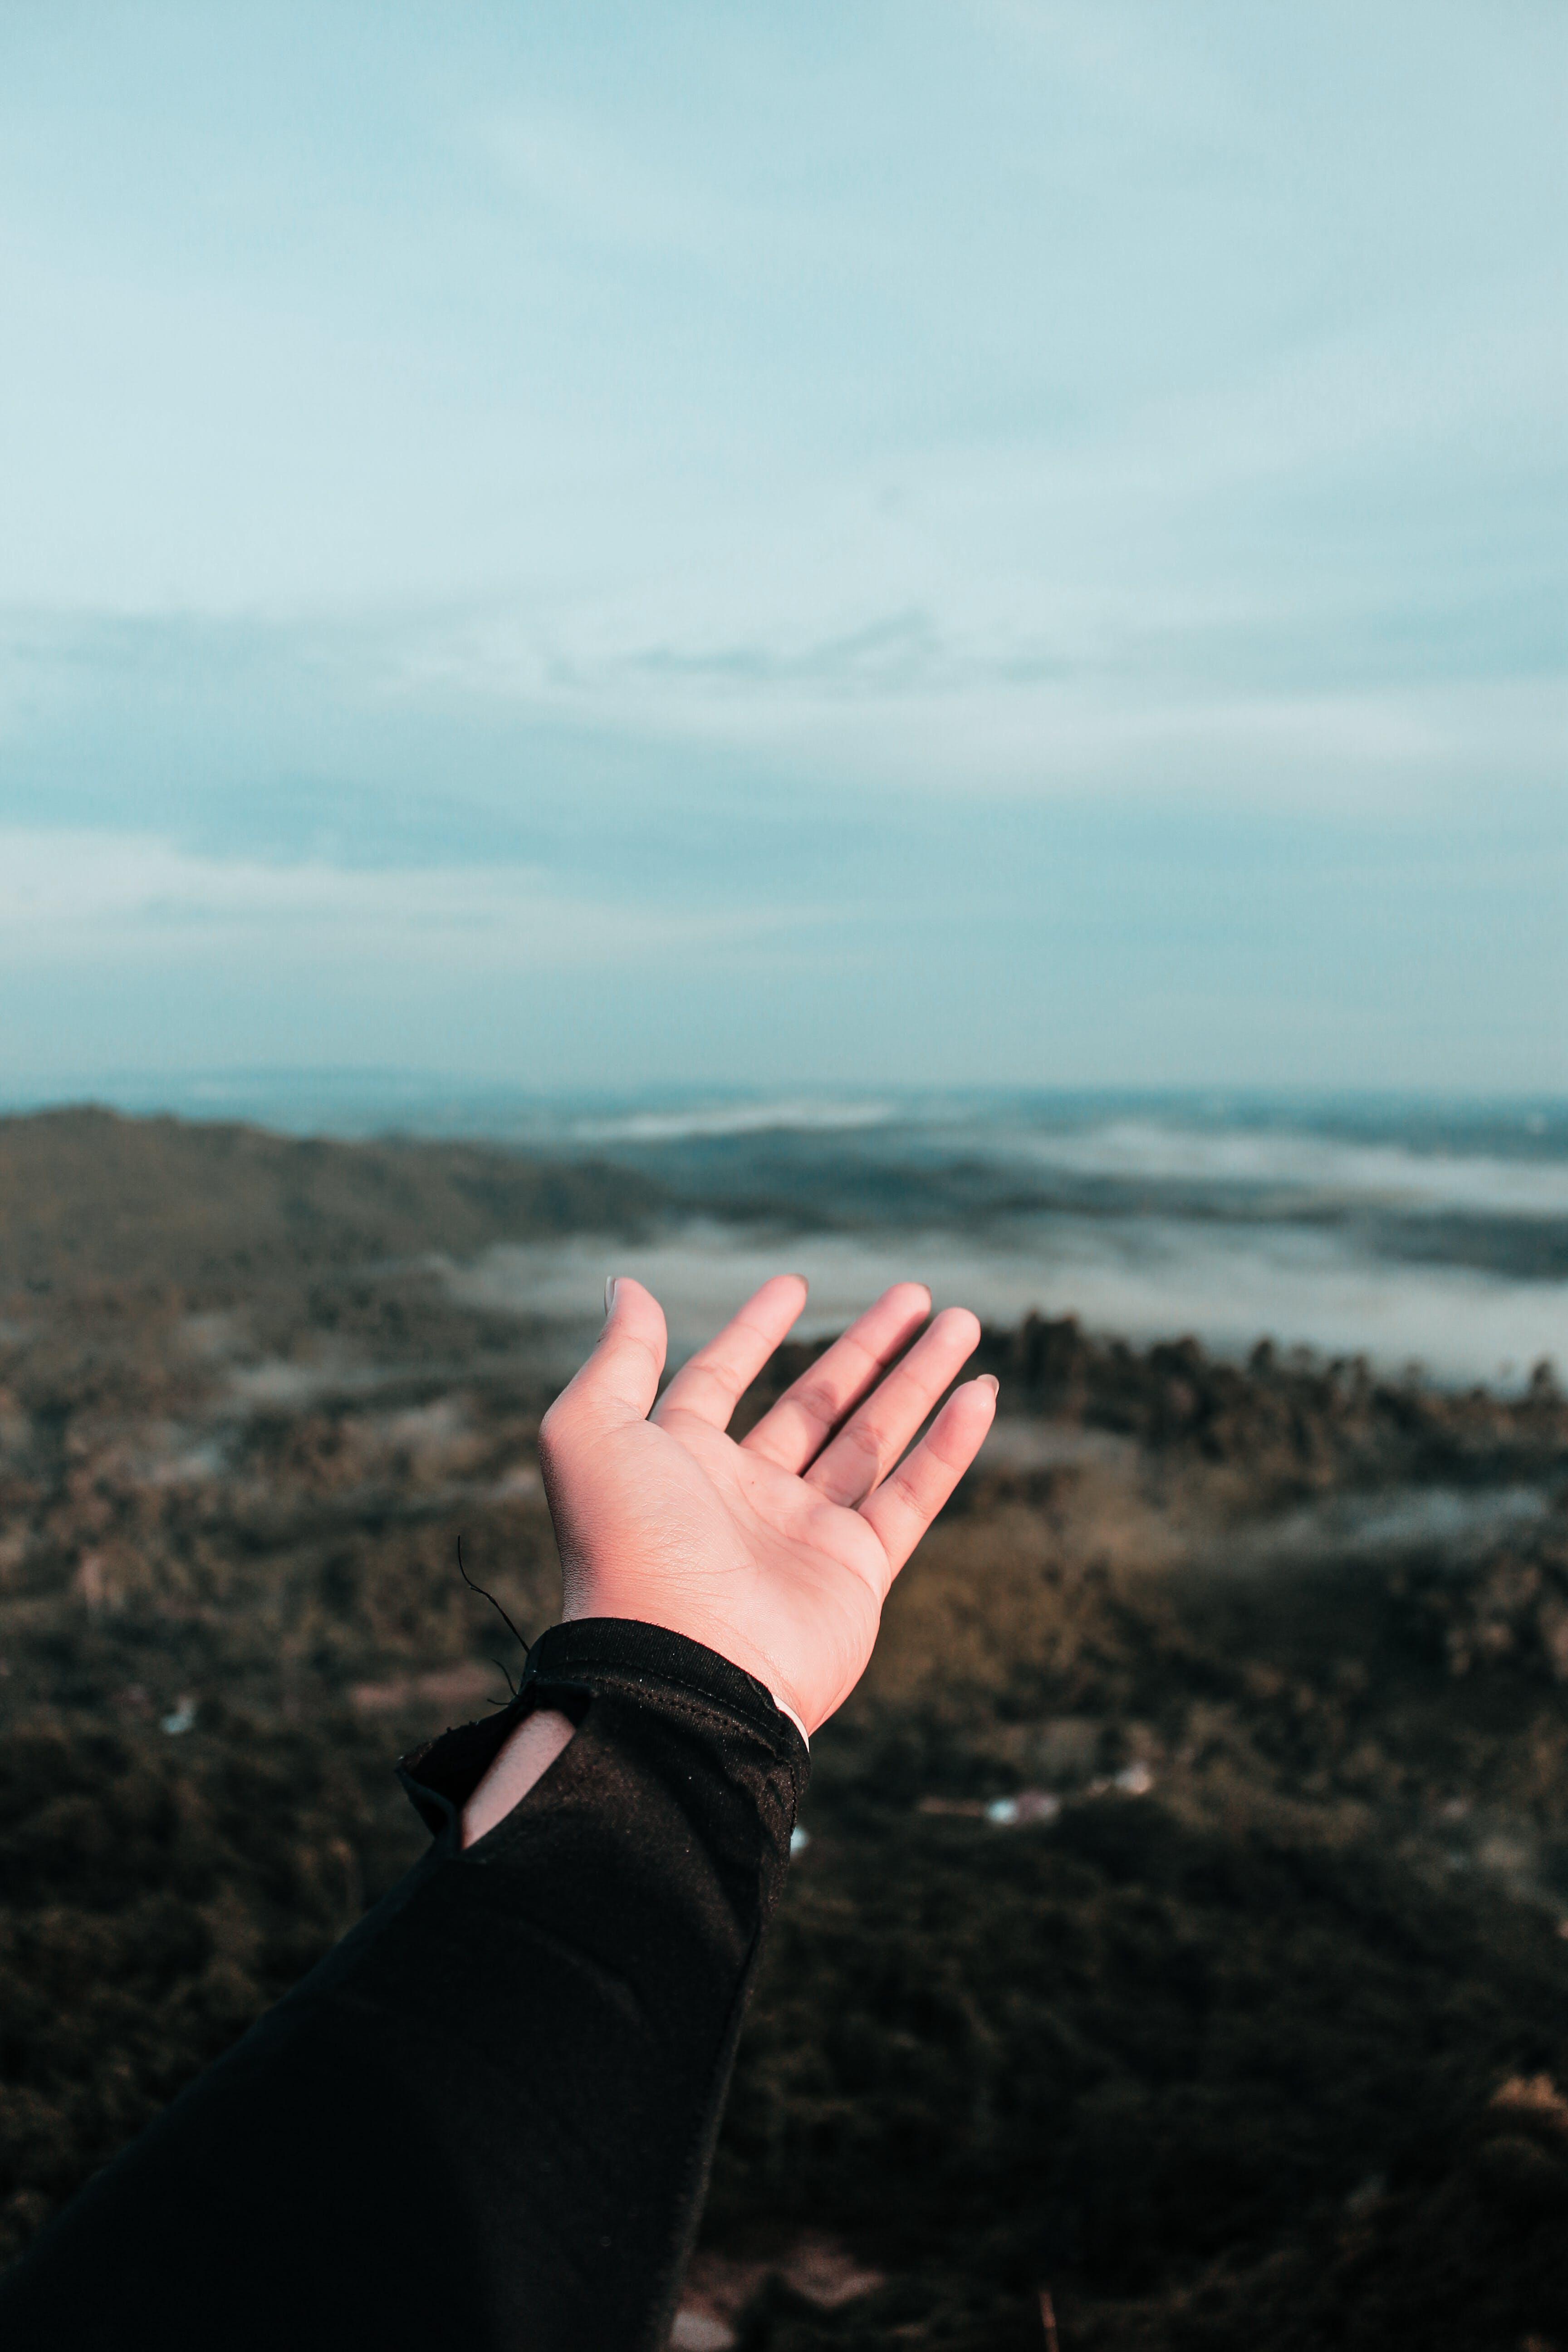 Man's Left Hand